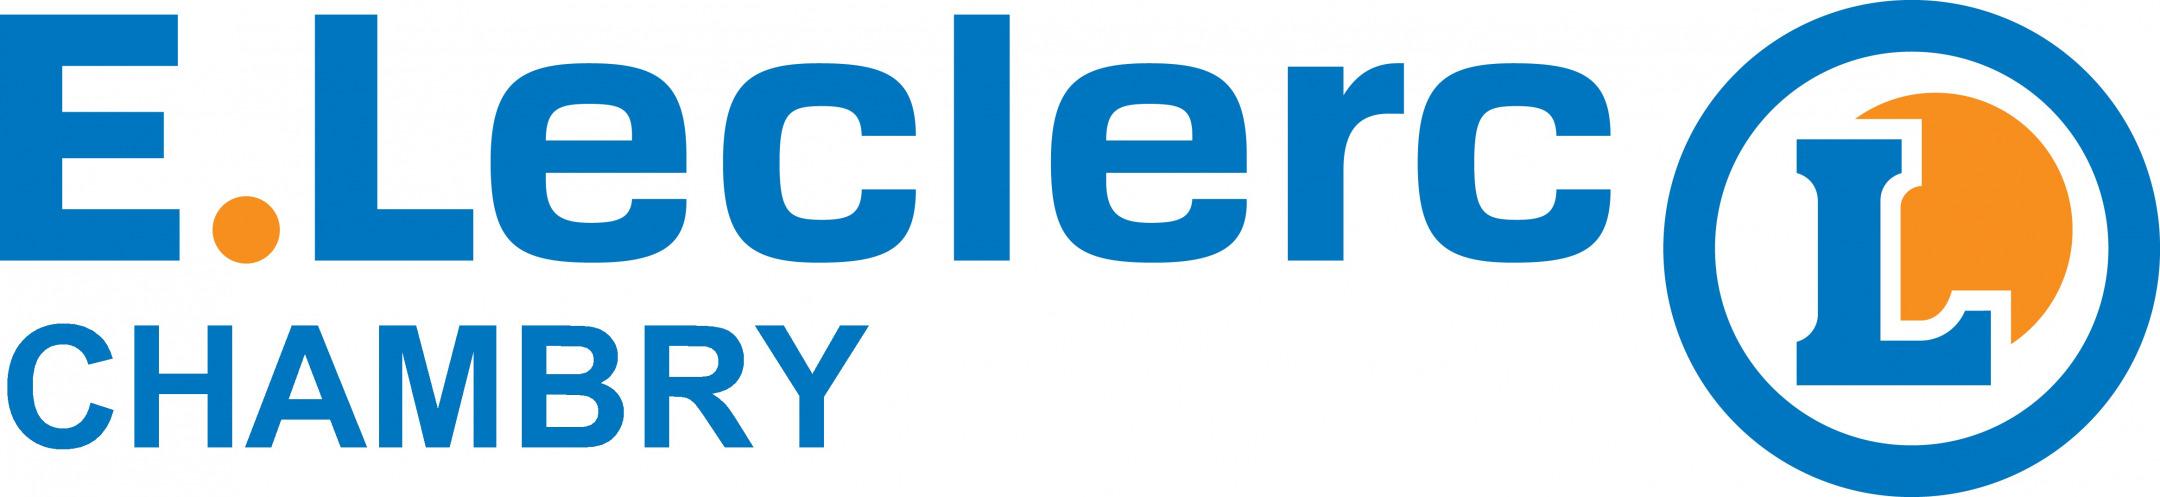 Centre E. Leclerc Chambry – LAONDIS